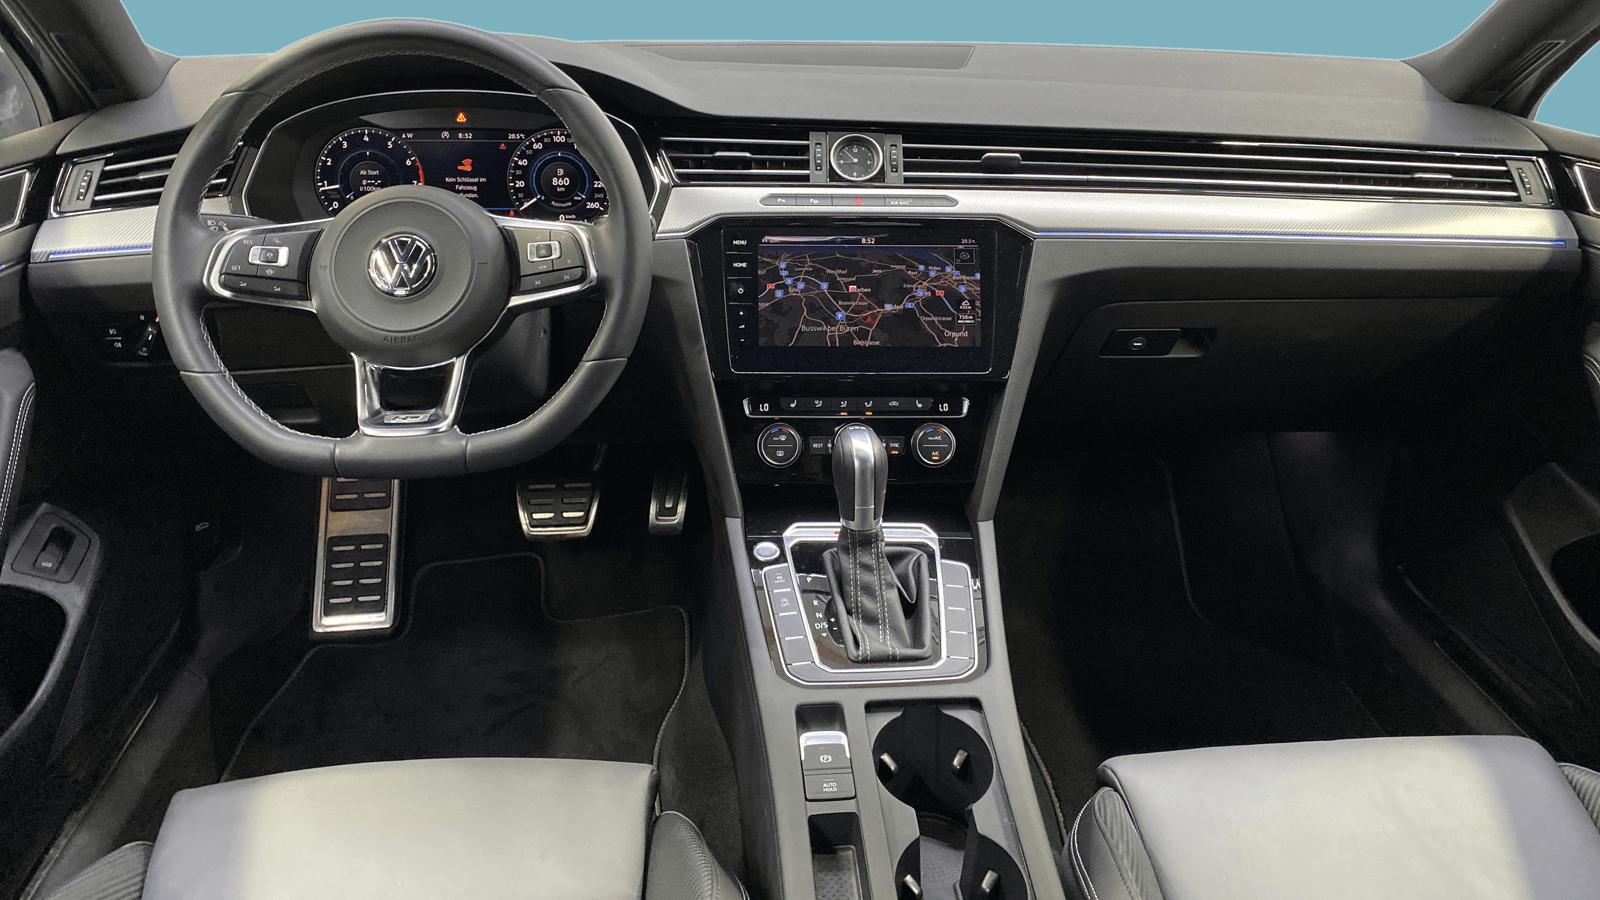 VW Passat Variant Silber interior - Clyde Auto-Abo